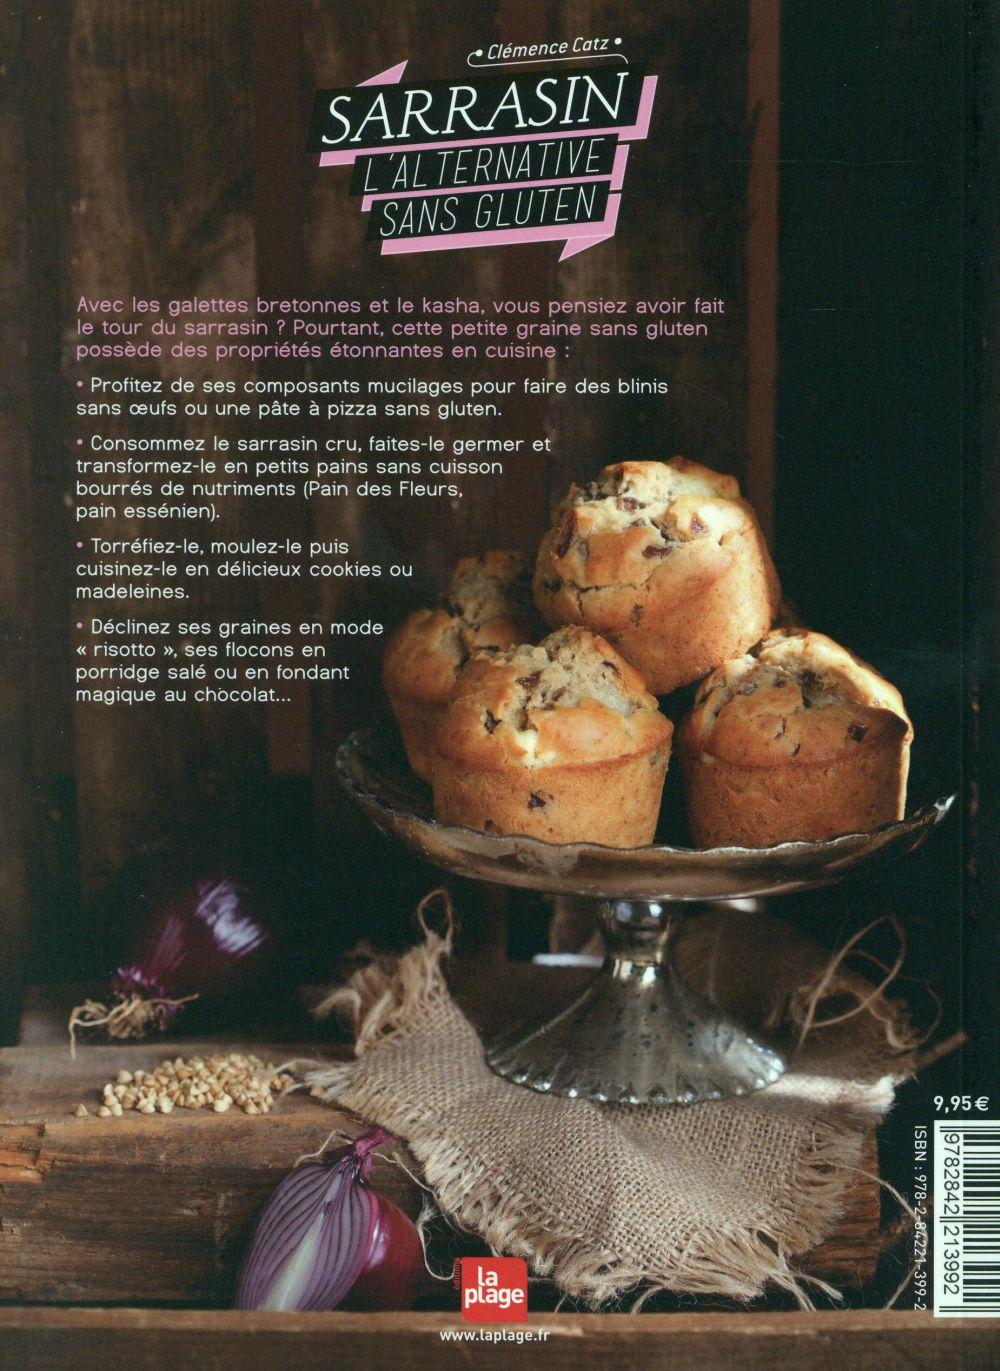 Sarrasin ; l'alternative sans gluten